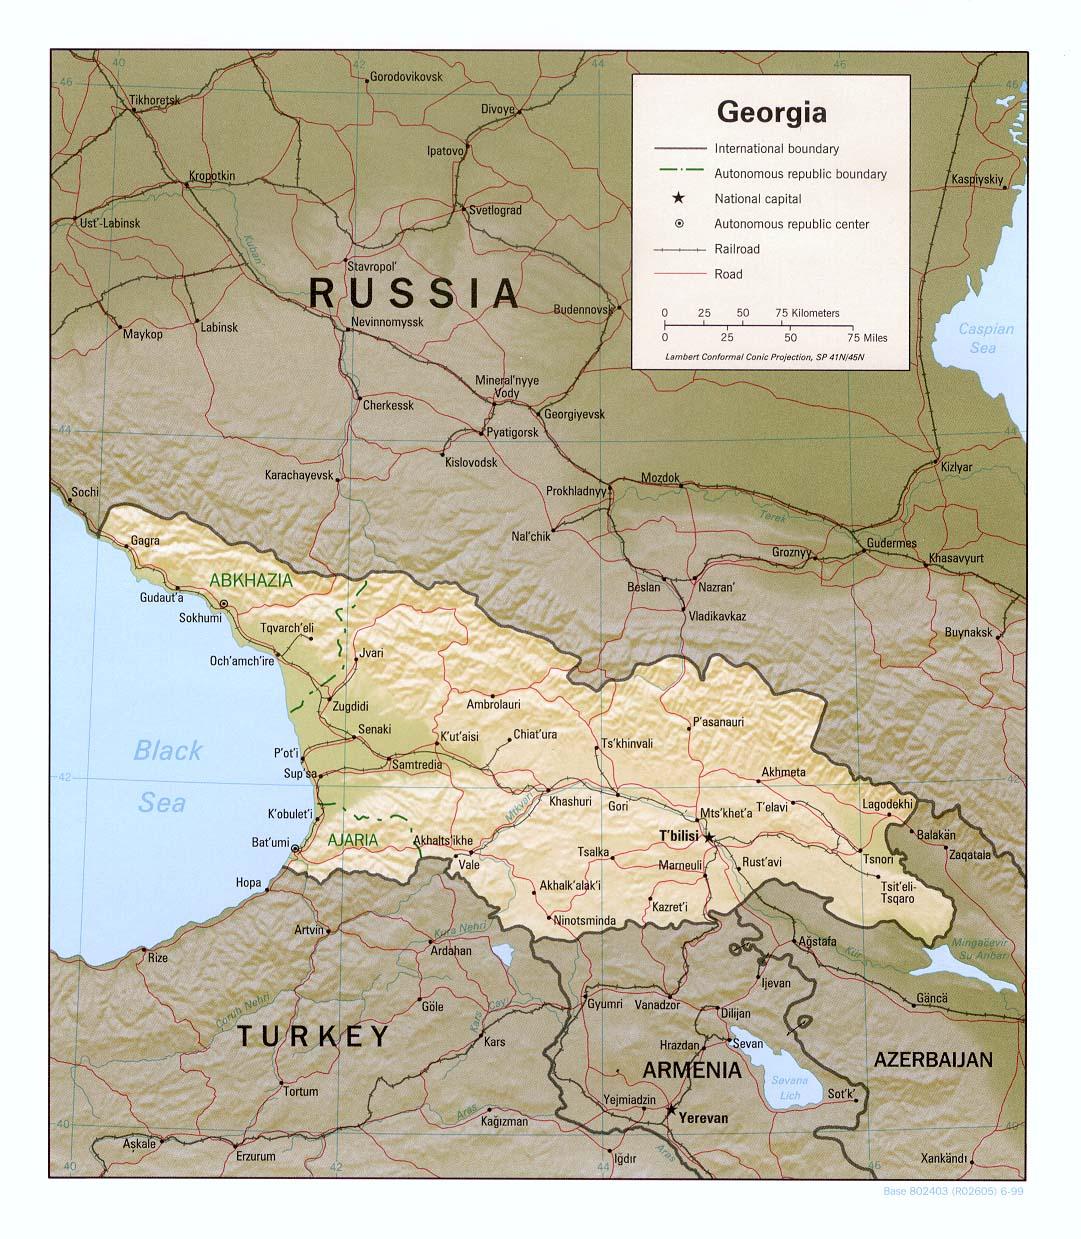 Free Map Of Georgia.Download Free Georgia Maps